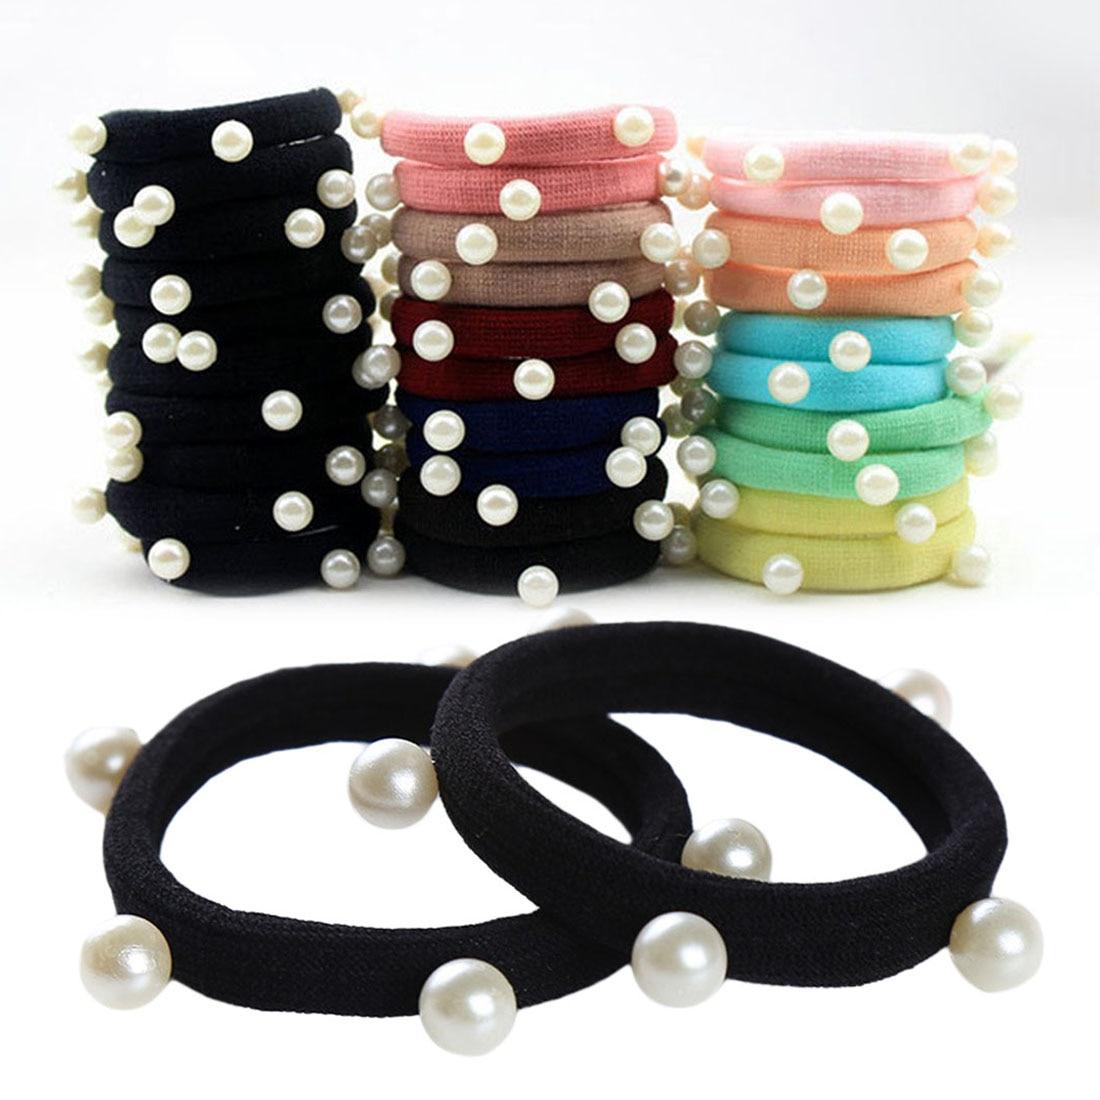 Women Girls' 10/20pcs Pearl Rubber Bands Elastics Headwear Seamless Gum Hair Hairbands Hair Accessories Rubberbands